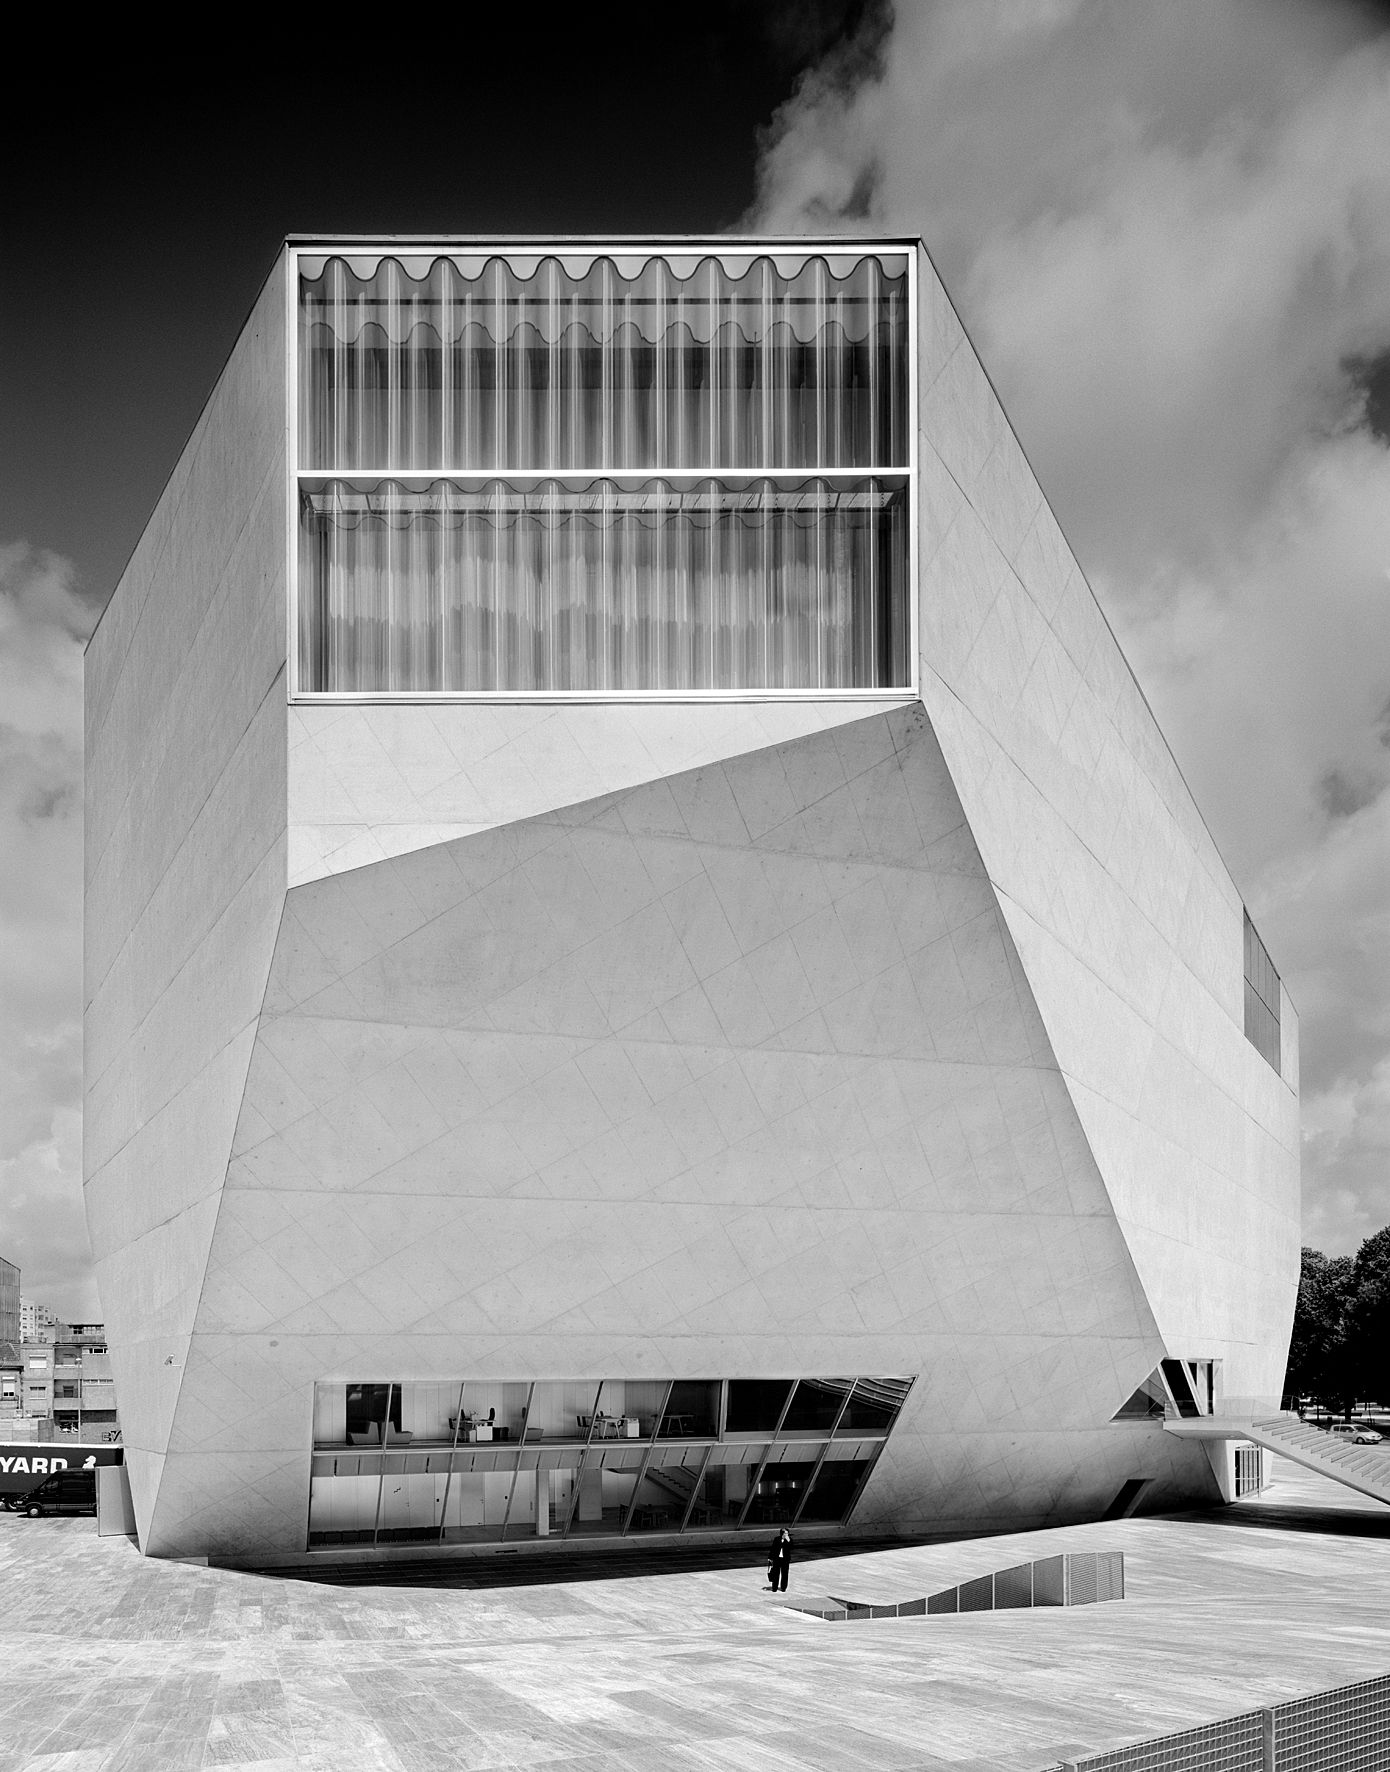 Rem koolhaas villa dall ava paris france 1991 atlas of - Rem Koolhaas Casa Da Musica Porto Portugal Ngphoto Com Pt